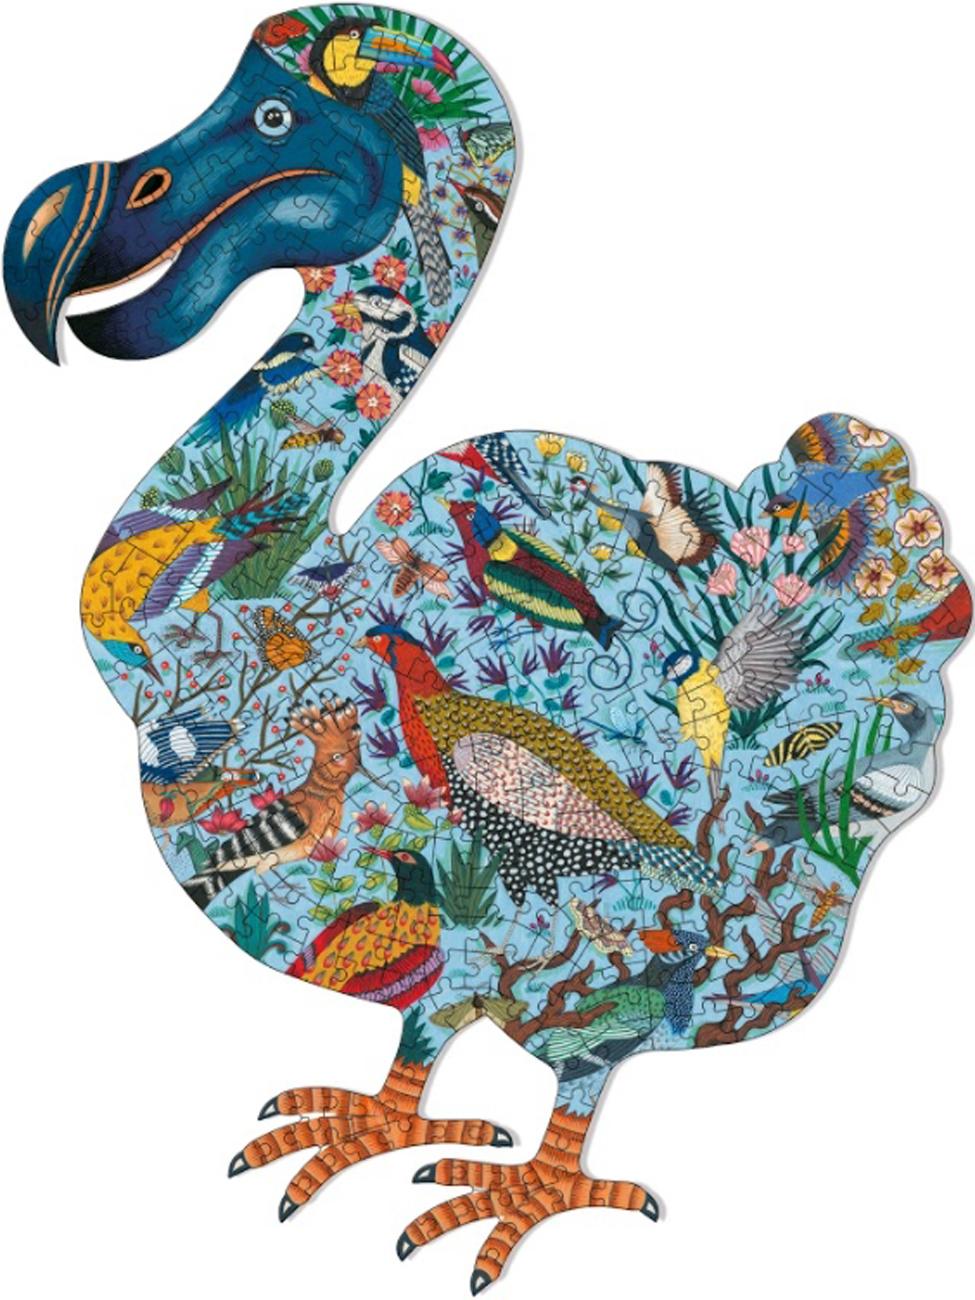 Dodo Birds Shaped Puzzle